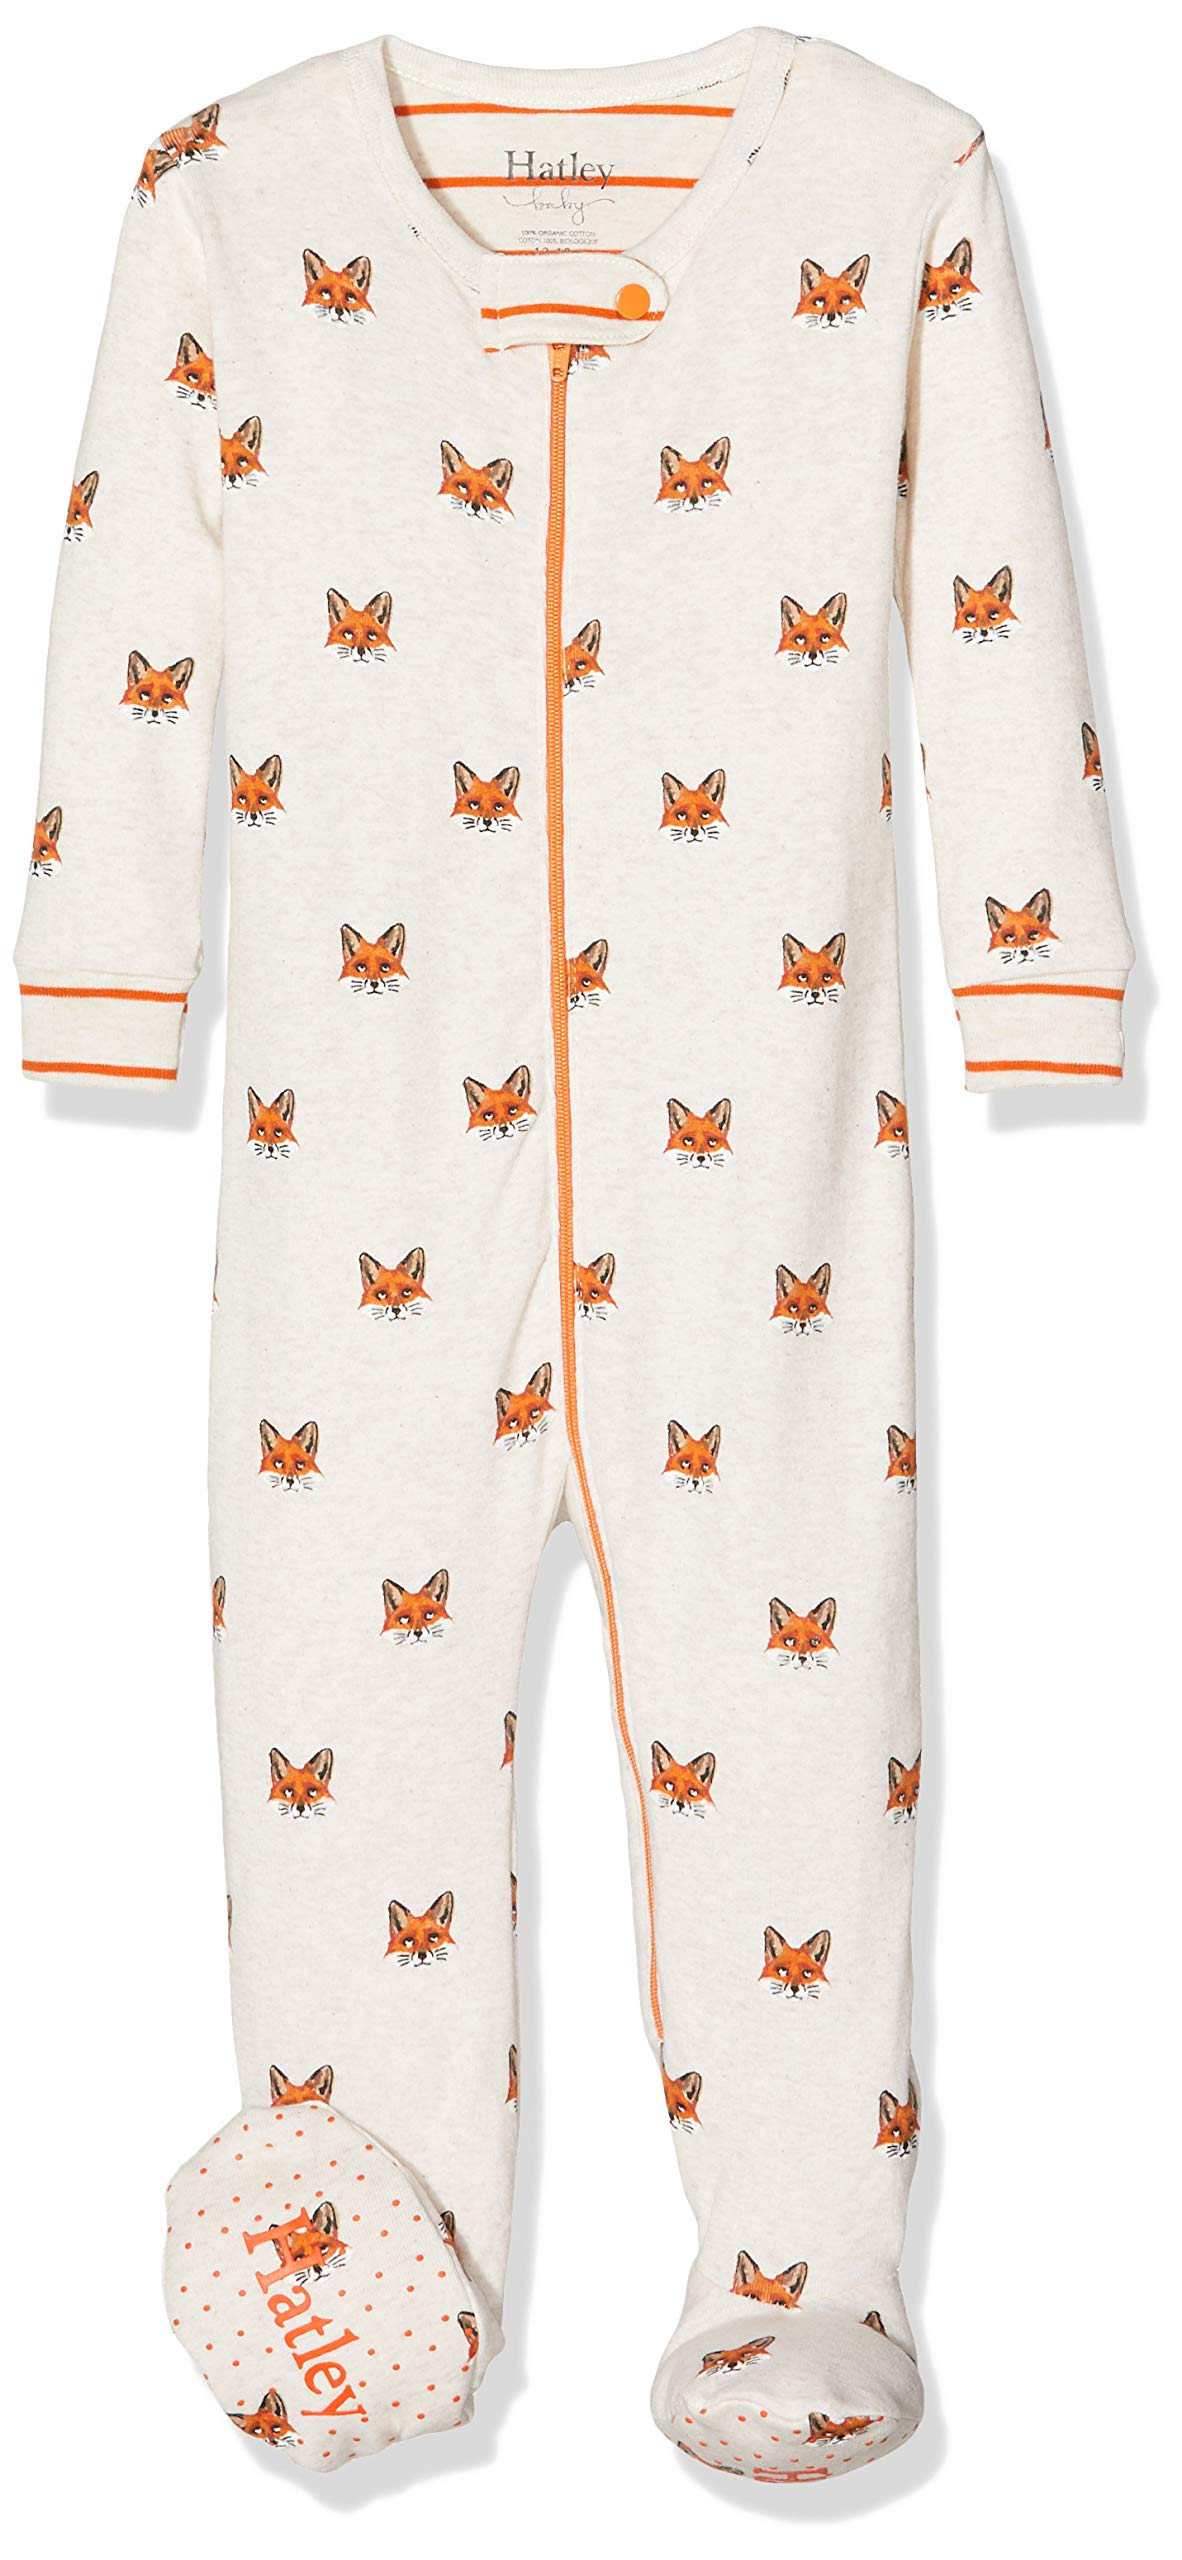 Hatley Organic Cotton Footed Sleepsuit Pelele para Dormir para Bebés 3